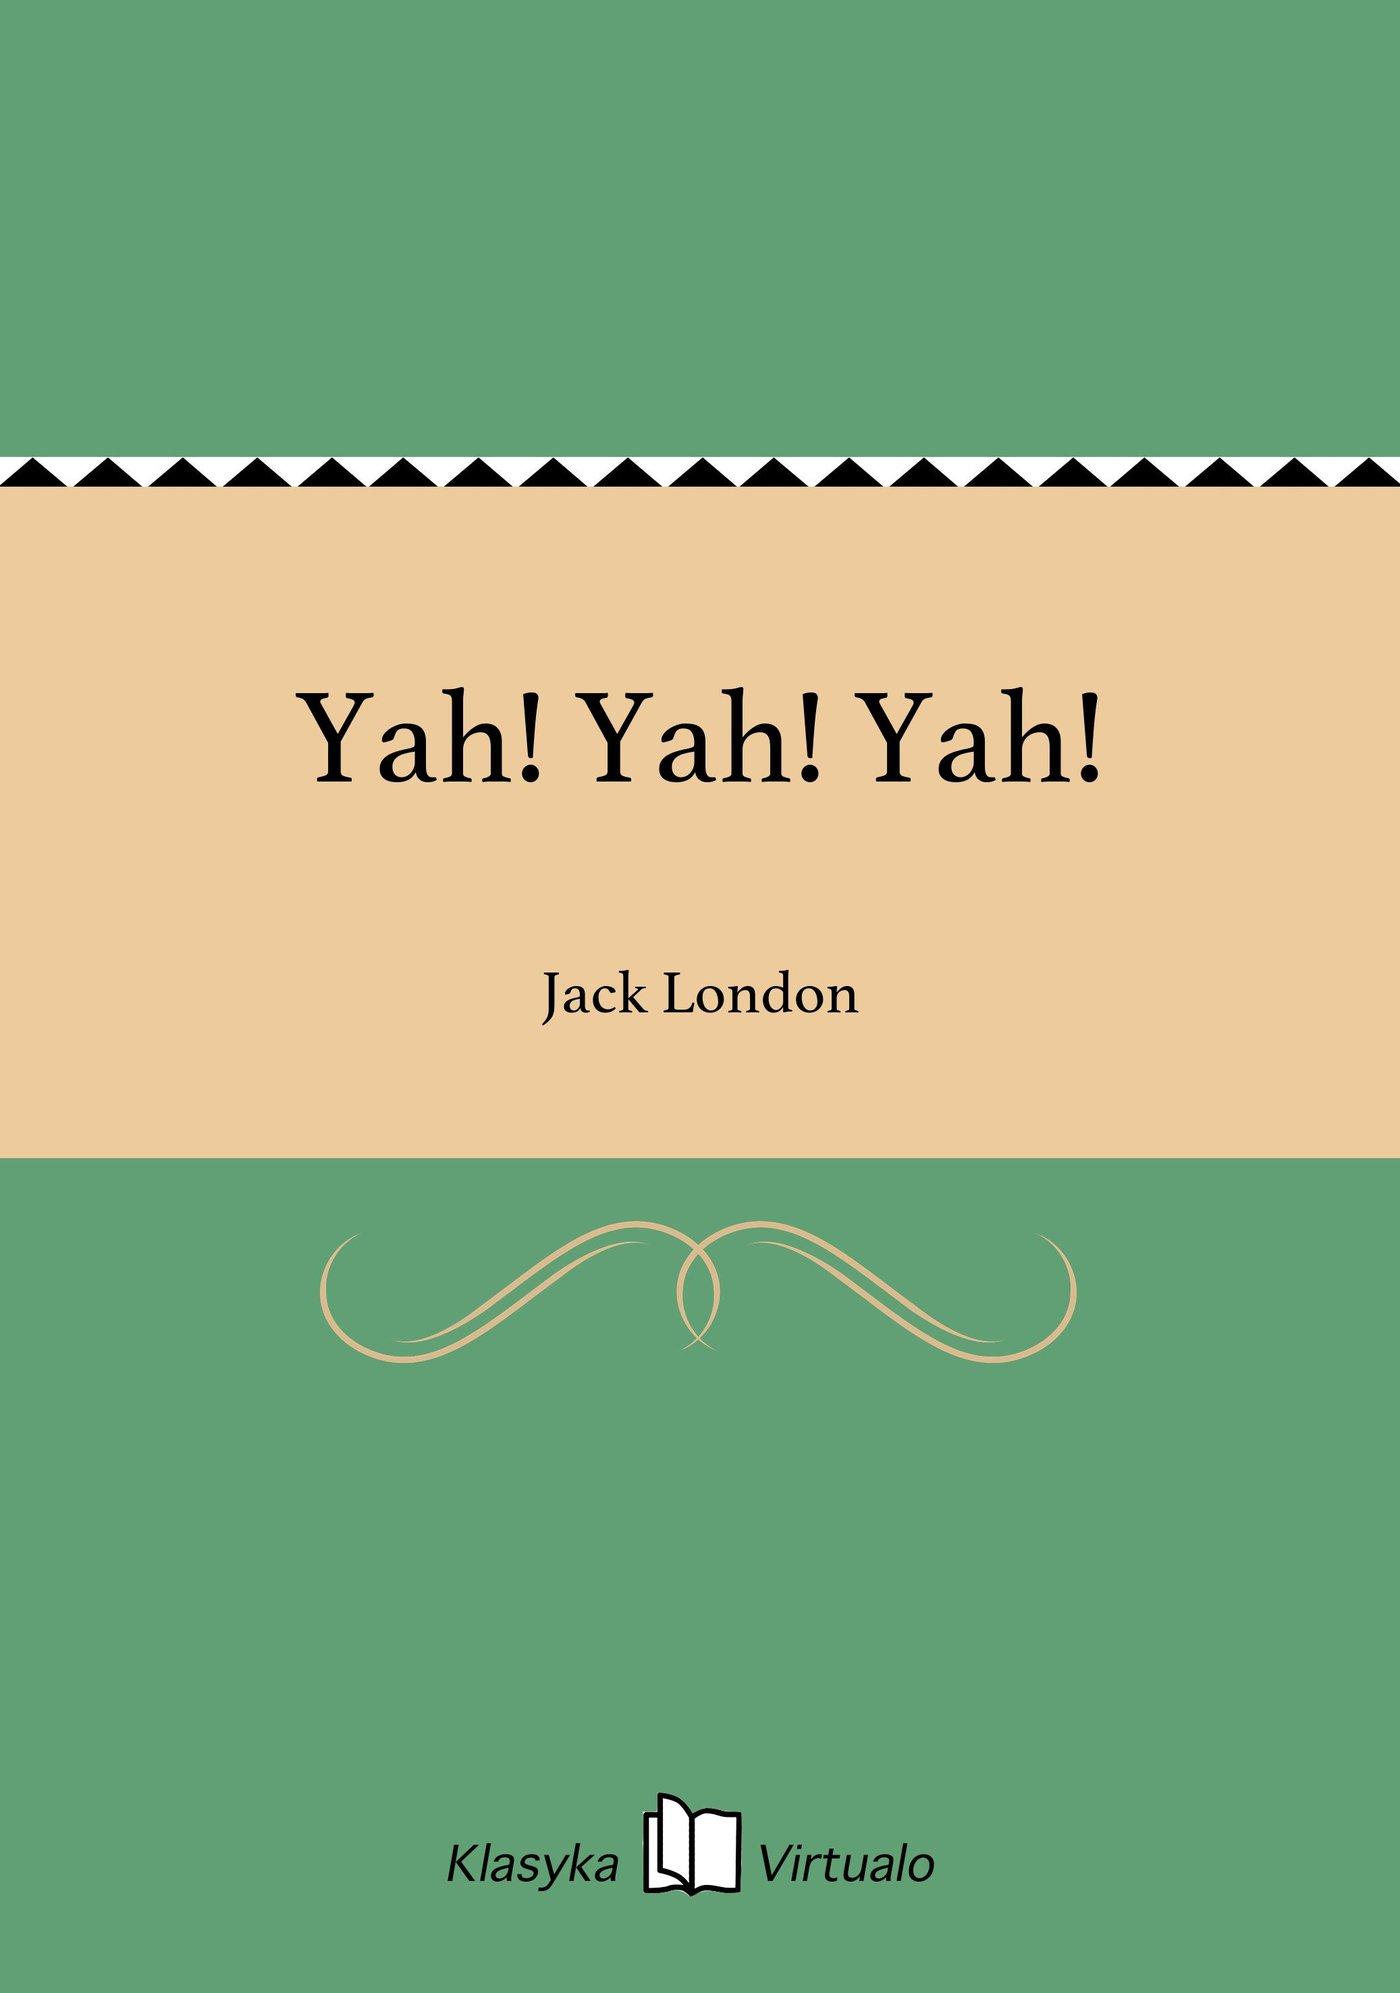 Yah! Yah! Yah! - Ebook (Książka EPUB) do pobrania w formacie EPUB